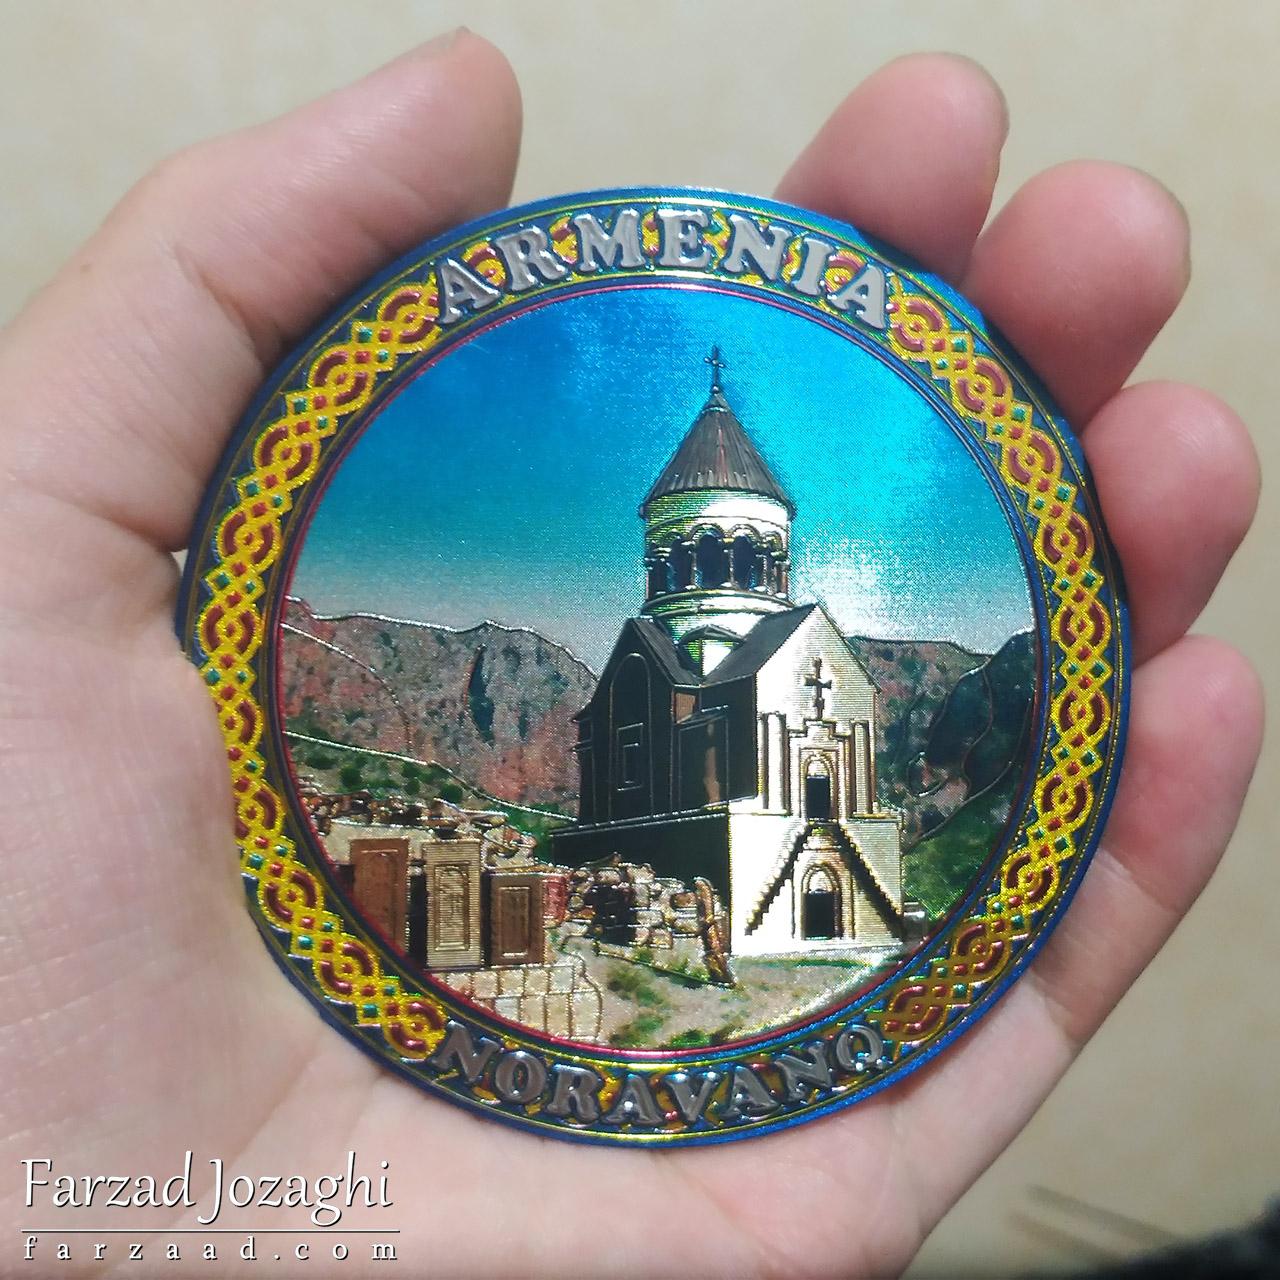 یادگاری مگنت کلیسا نوراوانک ارمنستان